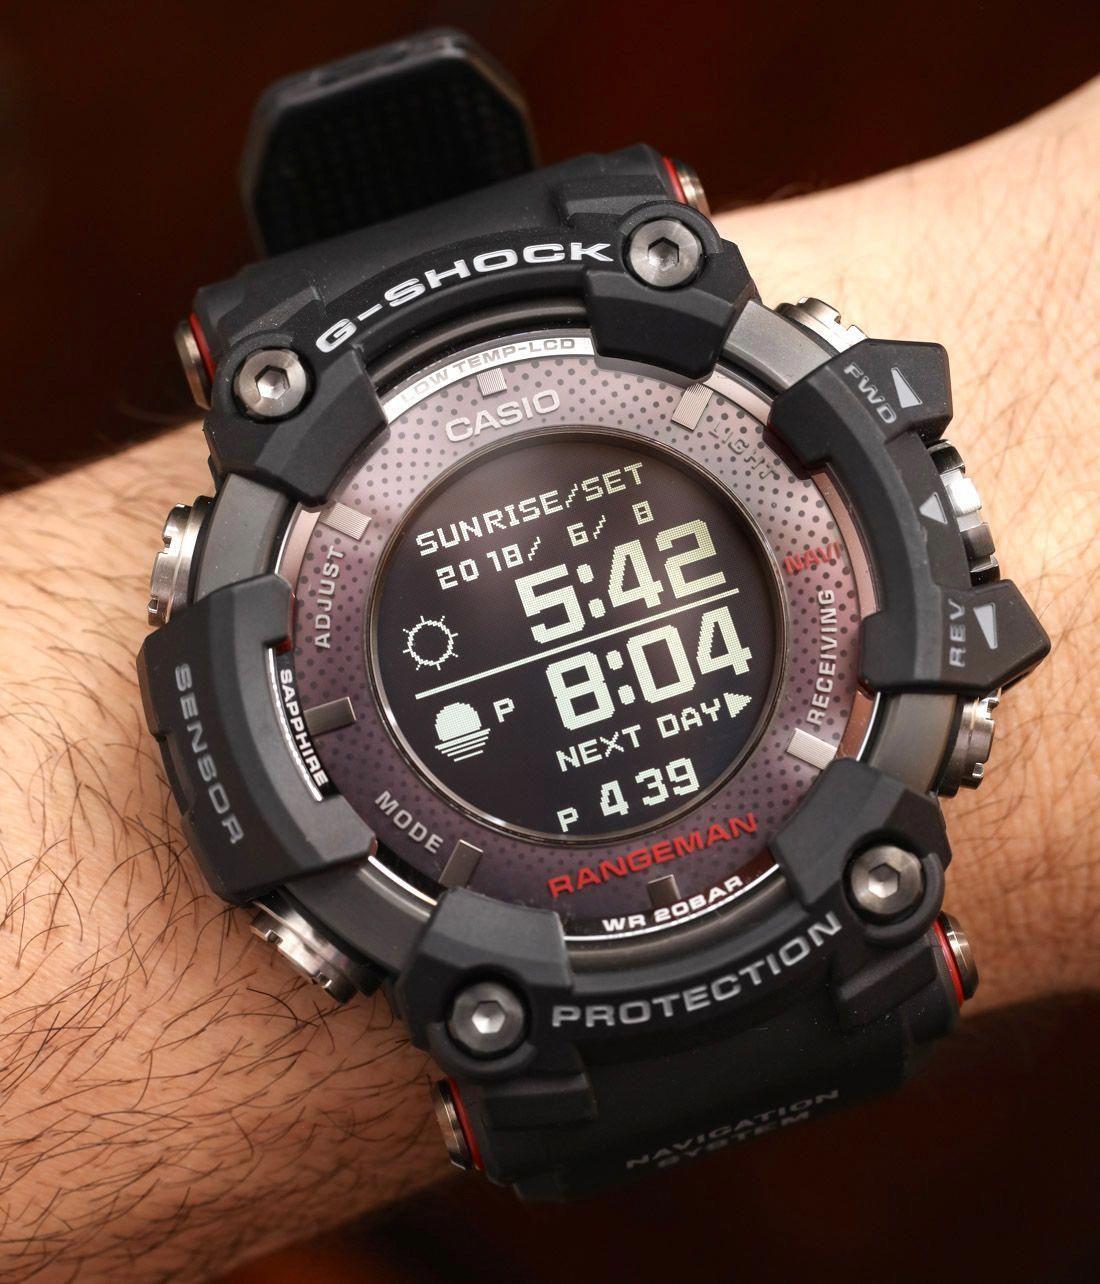 ae1b16033f861 Casio G-Shock Rangeman GPRB1000-1 GPS Watch Review  casio  gshock ...